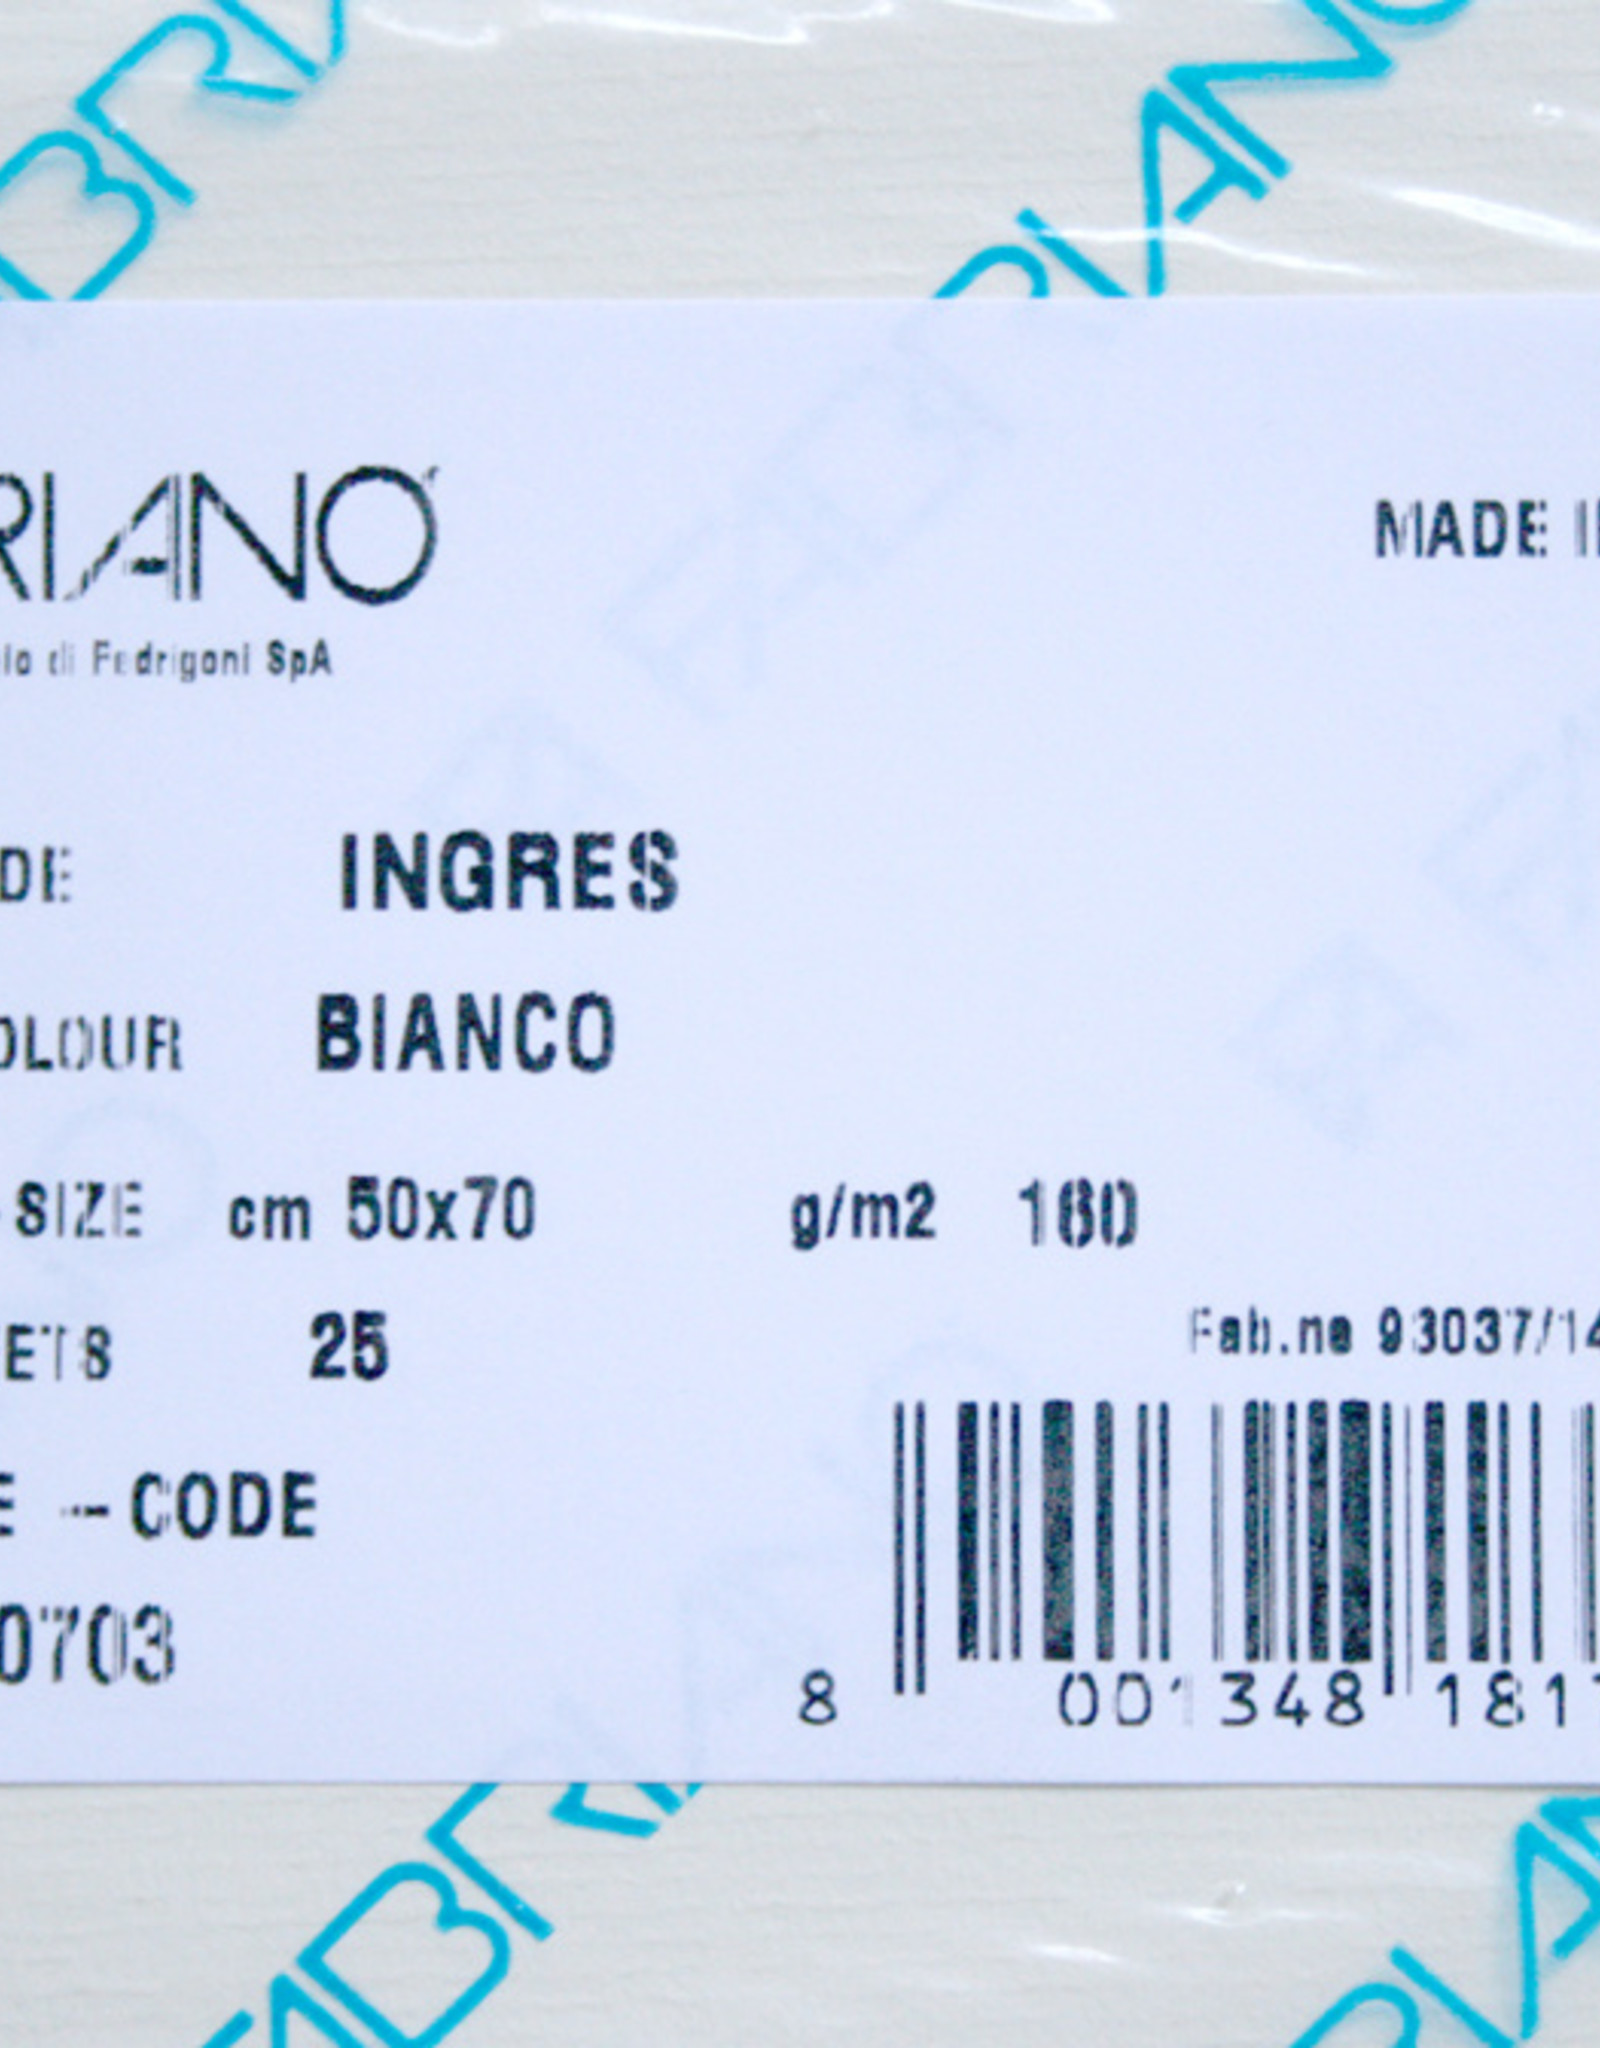 Fabriano 5 vel Ingres Papier 50 x 70 cm 160 grs Bianco Natuur Wit